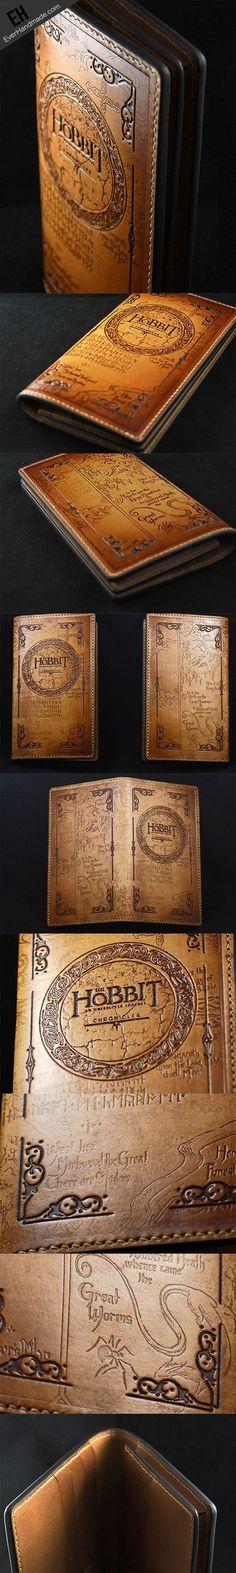 #Hobbits #hobbit Handmade carved hobbits hobbit Men leather long wallet,So stunning!!!!!!!!!!!!!!!!!!!!!!!!!! I NEED THIS. NEED NEED NEED NEED NEED.